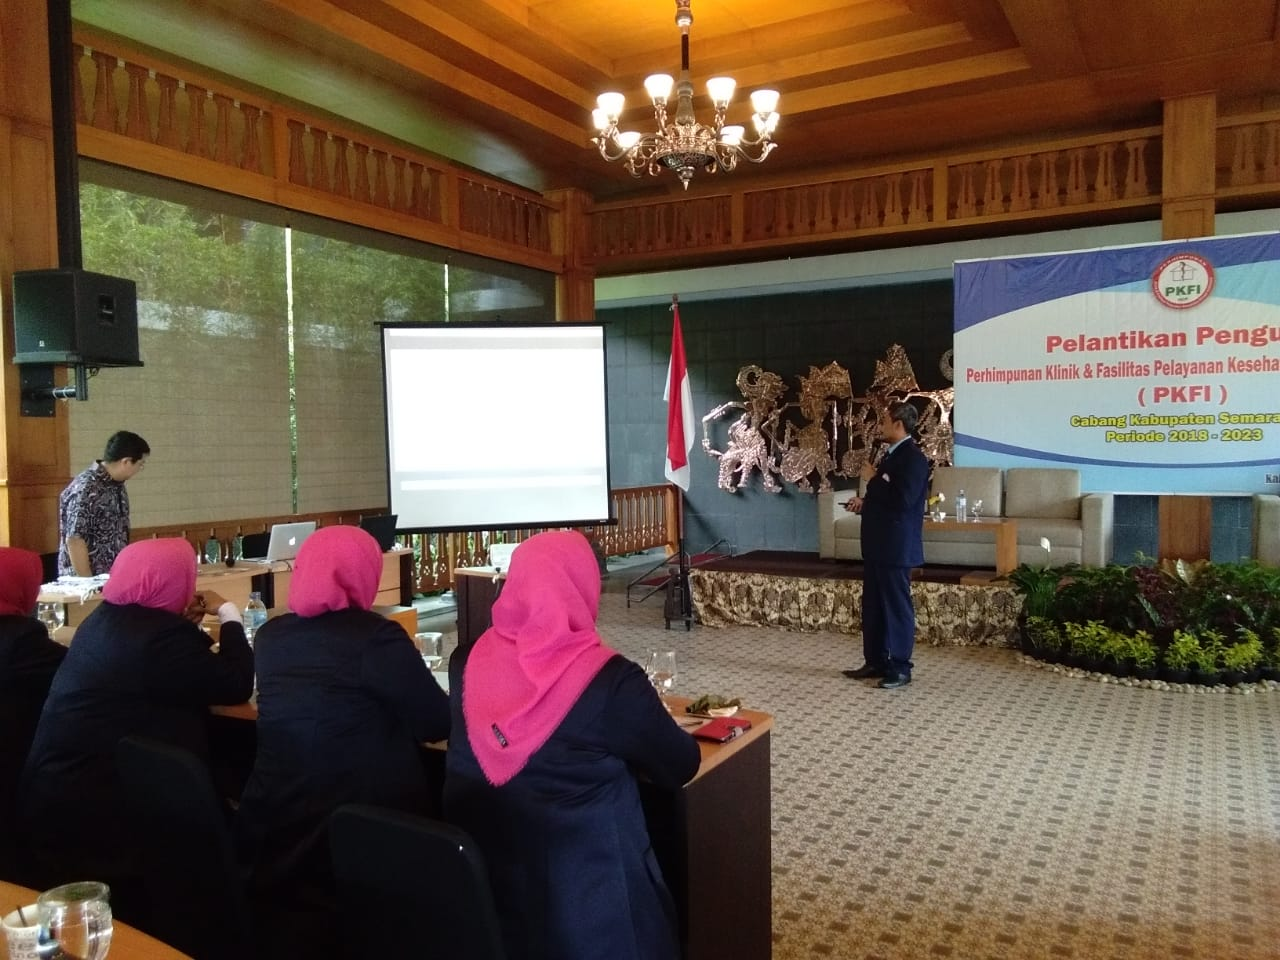 Mahasiswa a.n. dr Muh Husen Prabowo, MPH menjadi pembicara dalam acara pelantikan pengurus PKFI Cabang Kabupaten Semarang